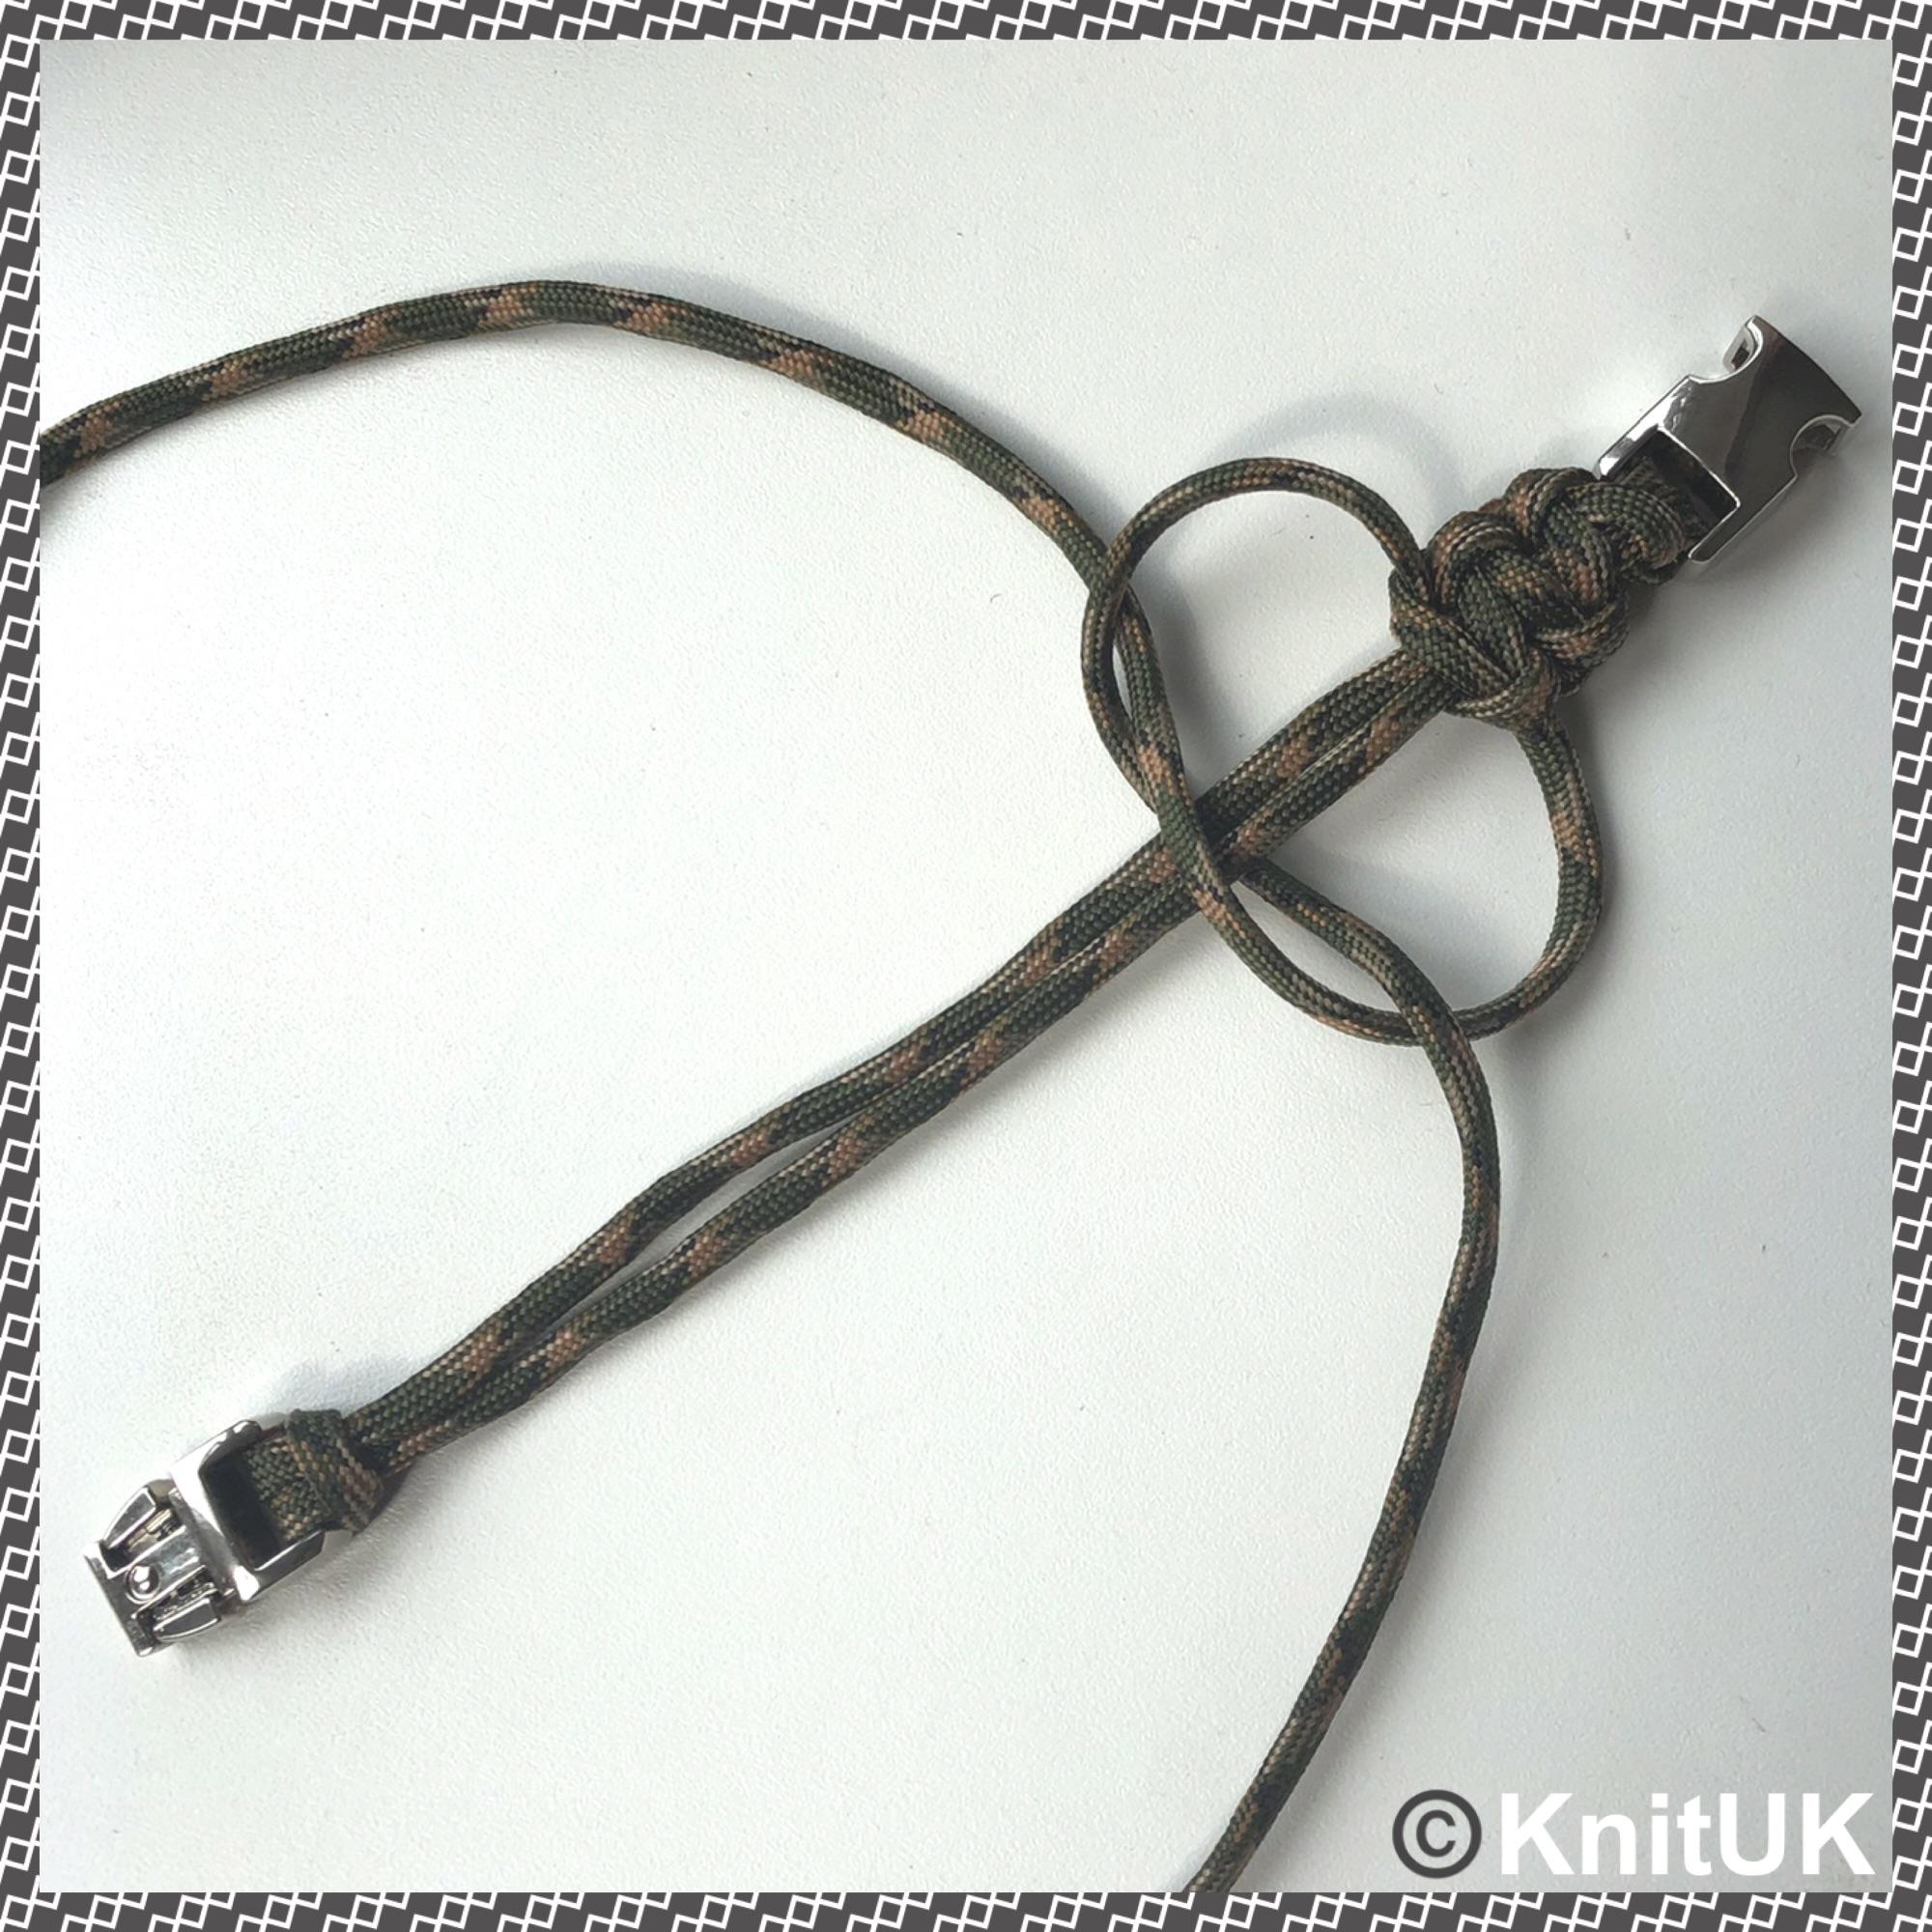 Knituk paracord 550 buckle bracelet